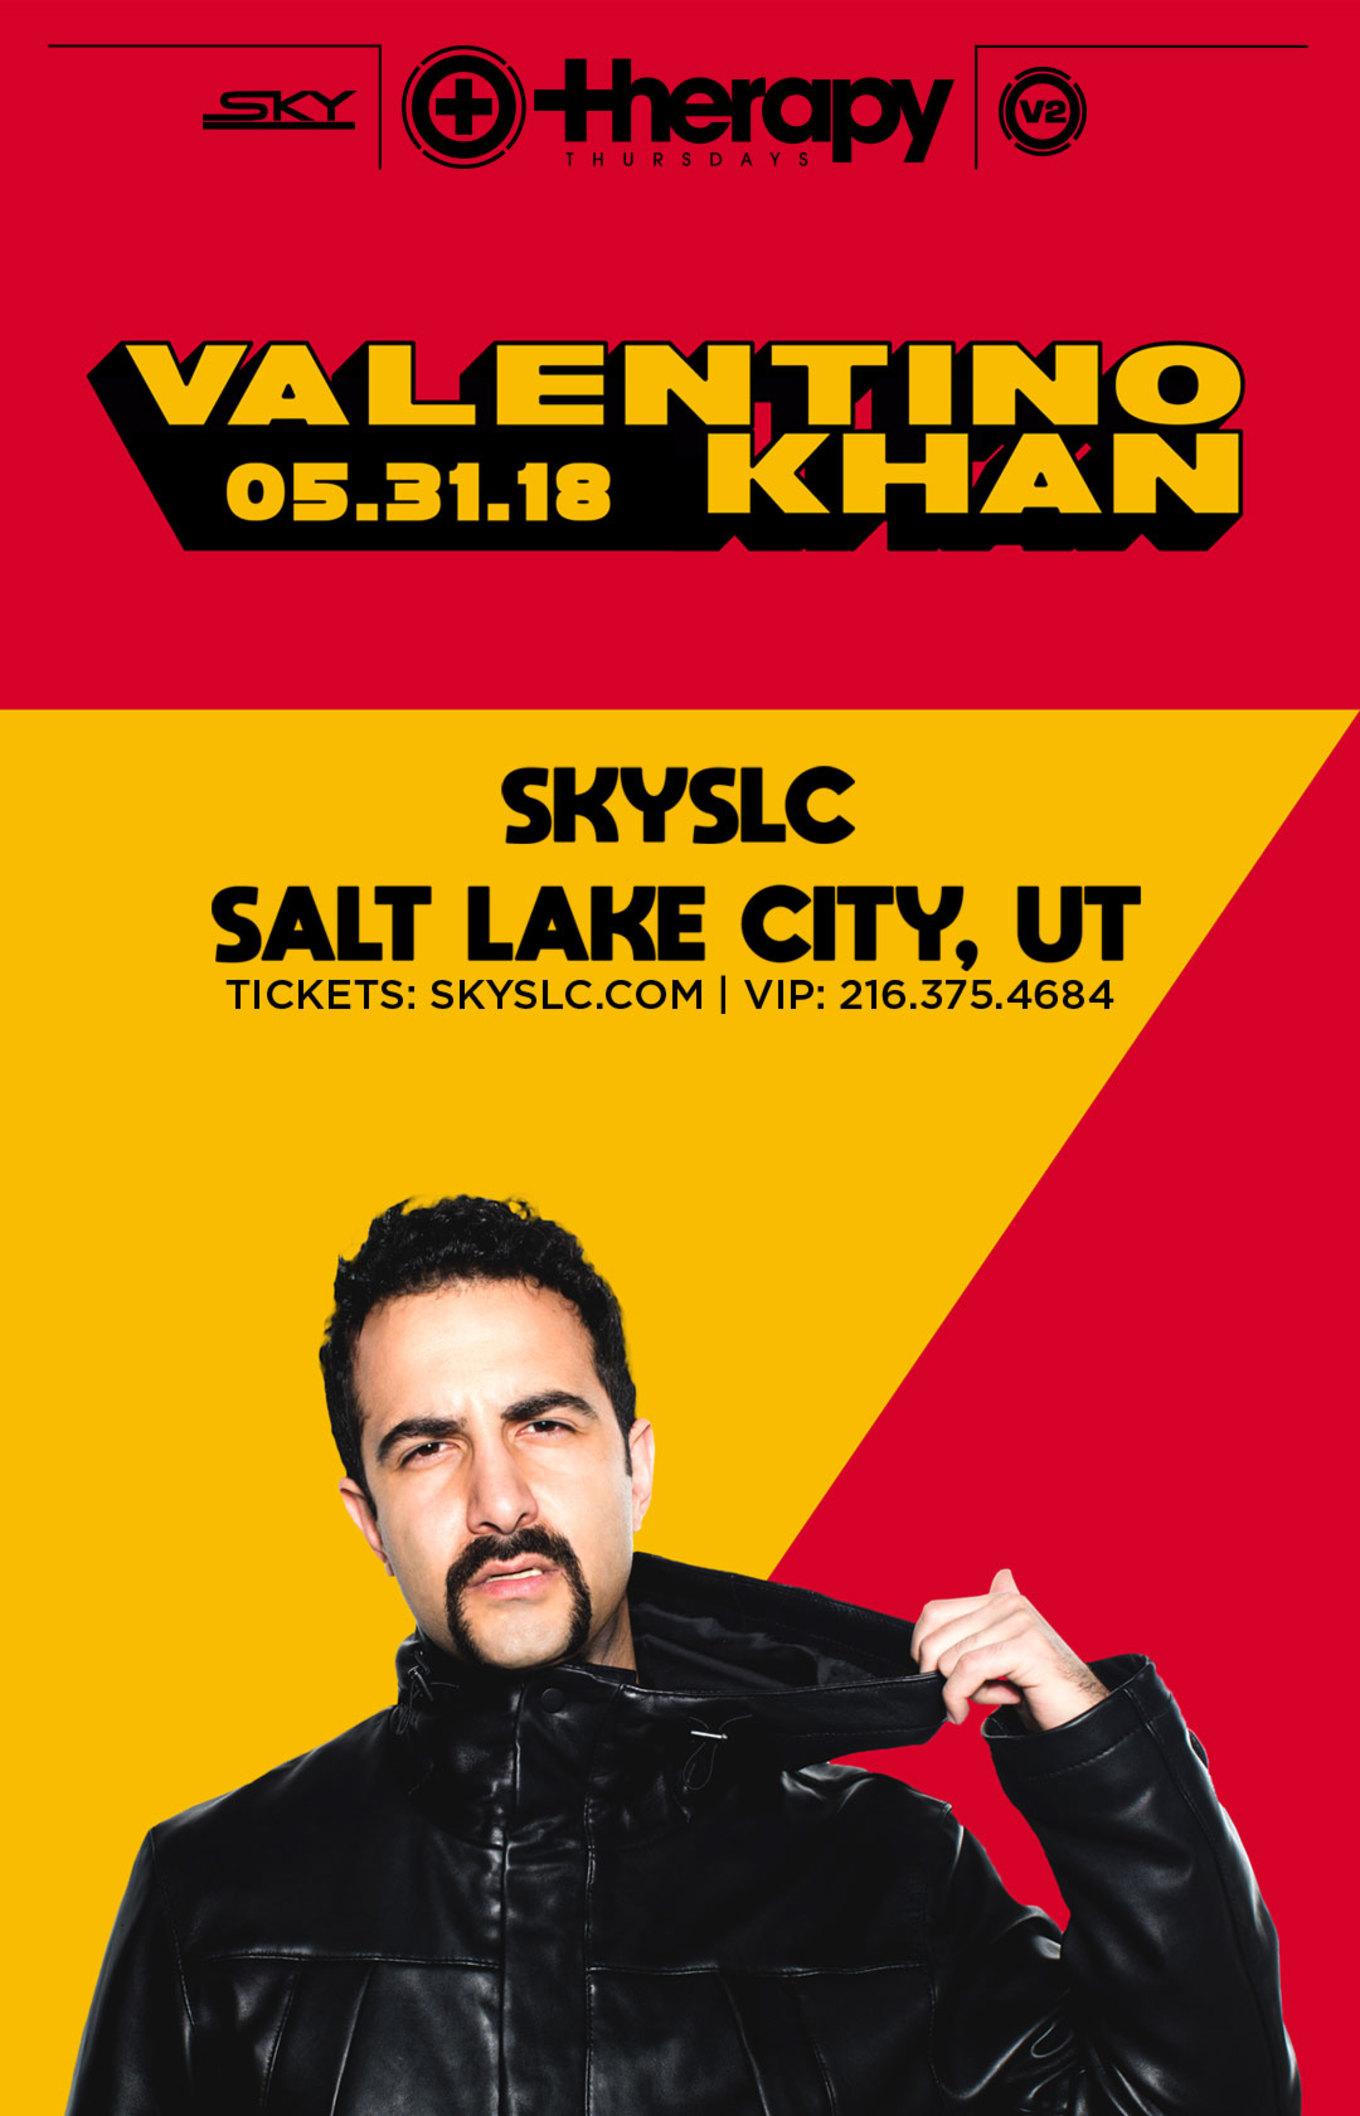 Therapy Thursdays : Valentino Khan - Tickets - Sky SLC, Salt